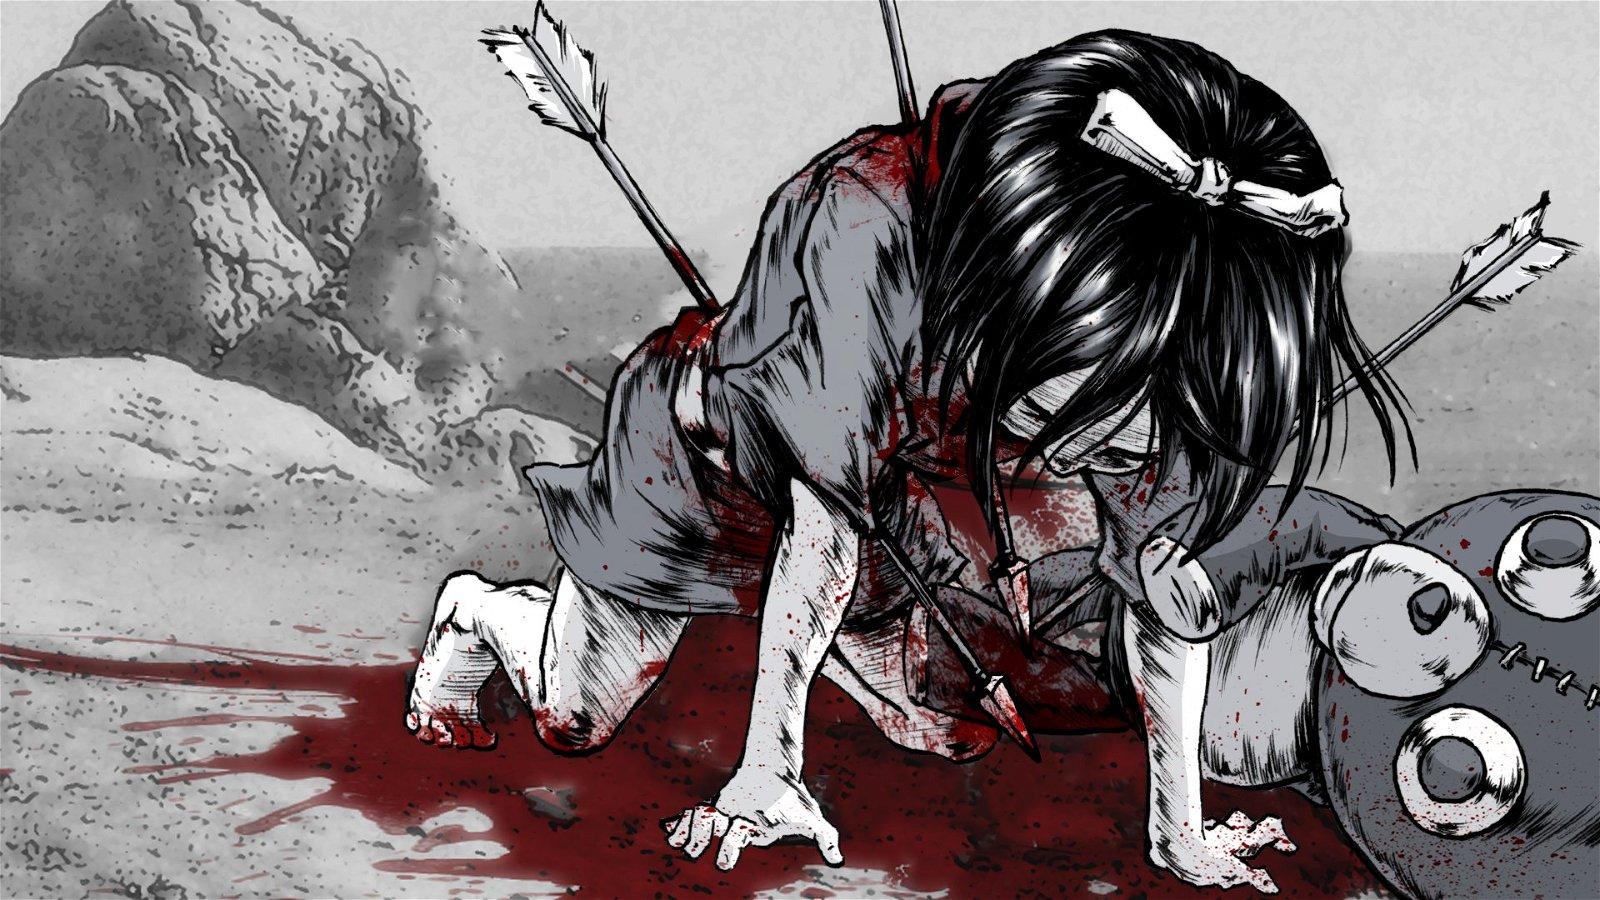 Versus Evil Explains the Disappearance of Afro Samurai 2